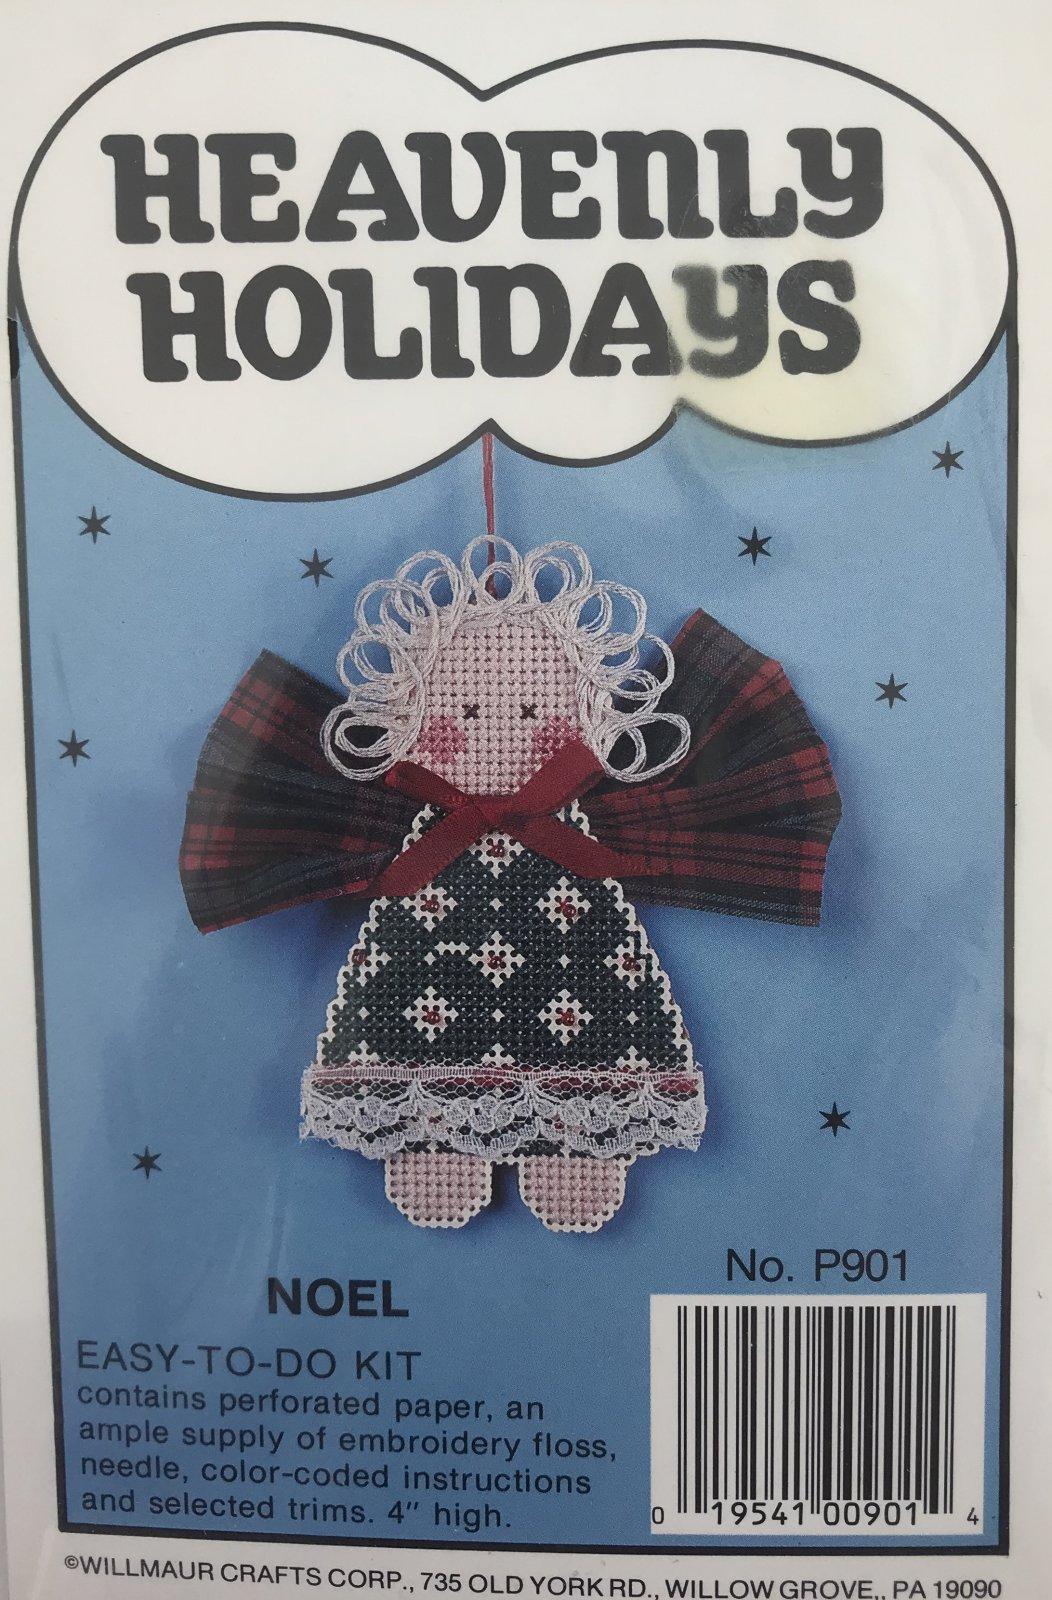 Astor Place: Heavenly Holidays Noel Kit P901